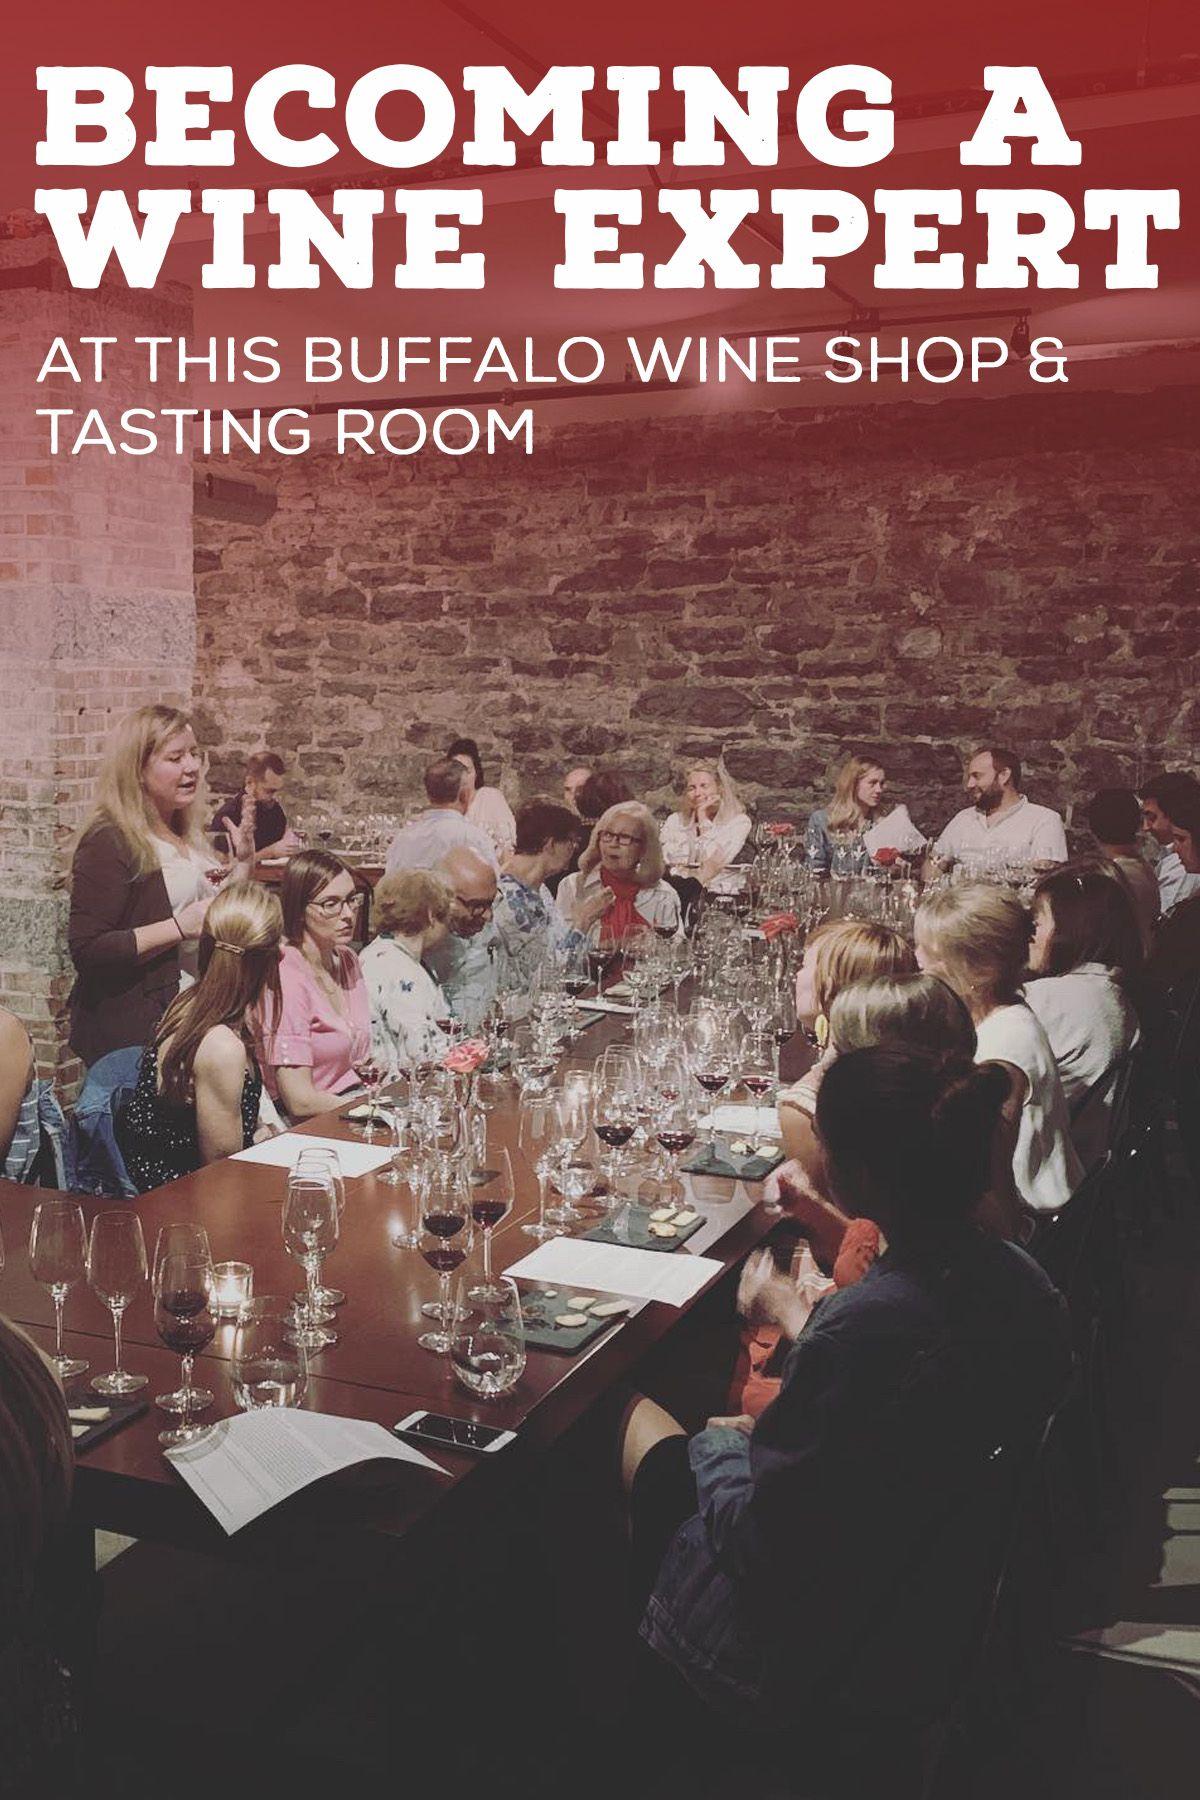 Wine Tasting In Buffalo In 2020 Wine Expert Wine Source Wine